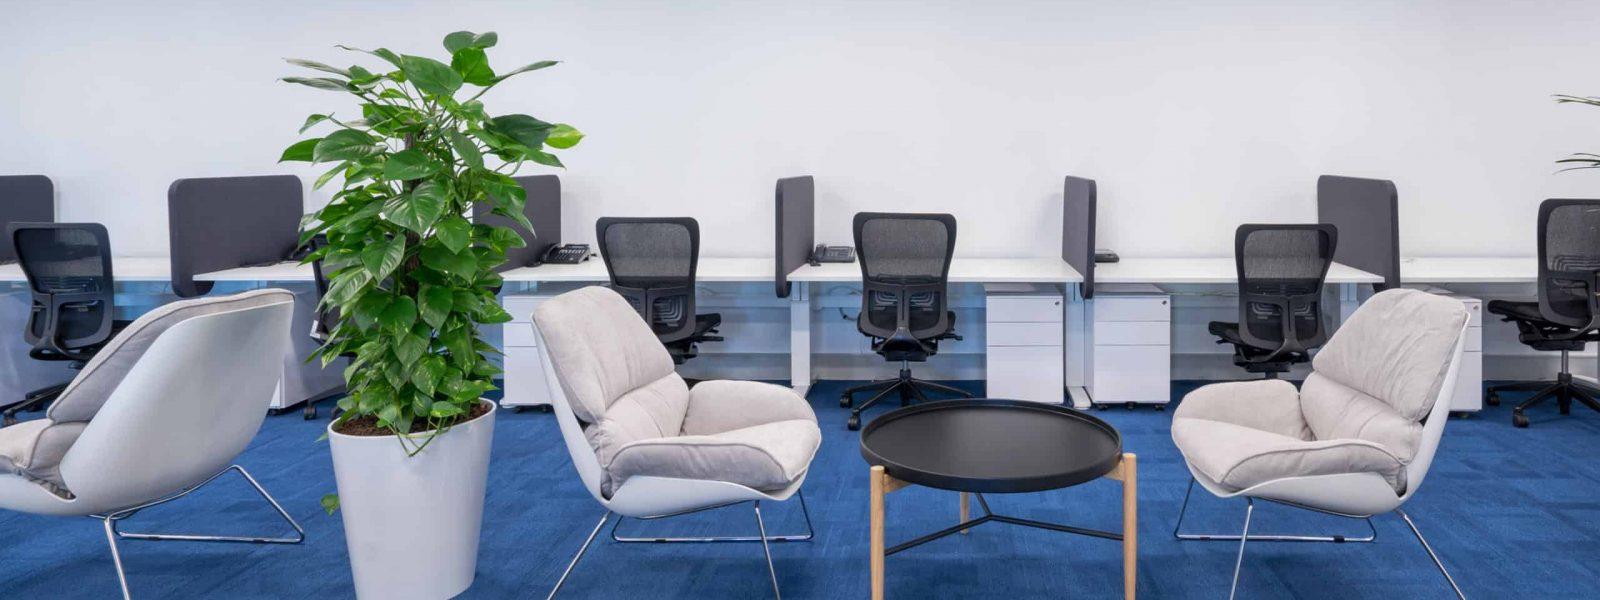 Office Fitouts Melbourne, Samsung | Contour Interiors